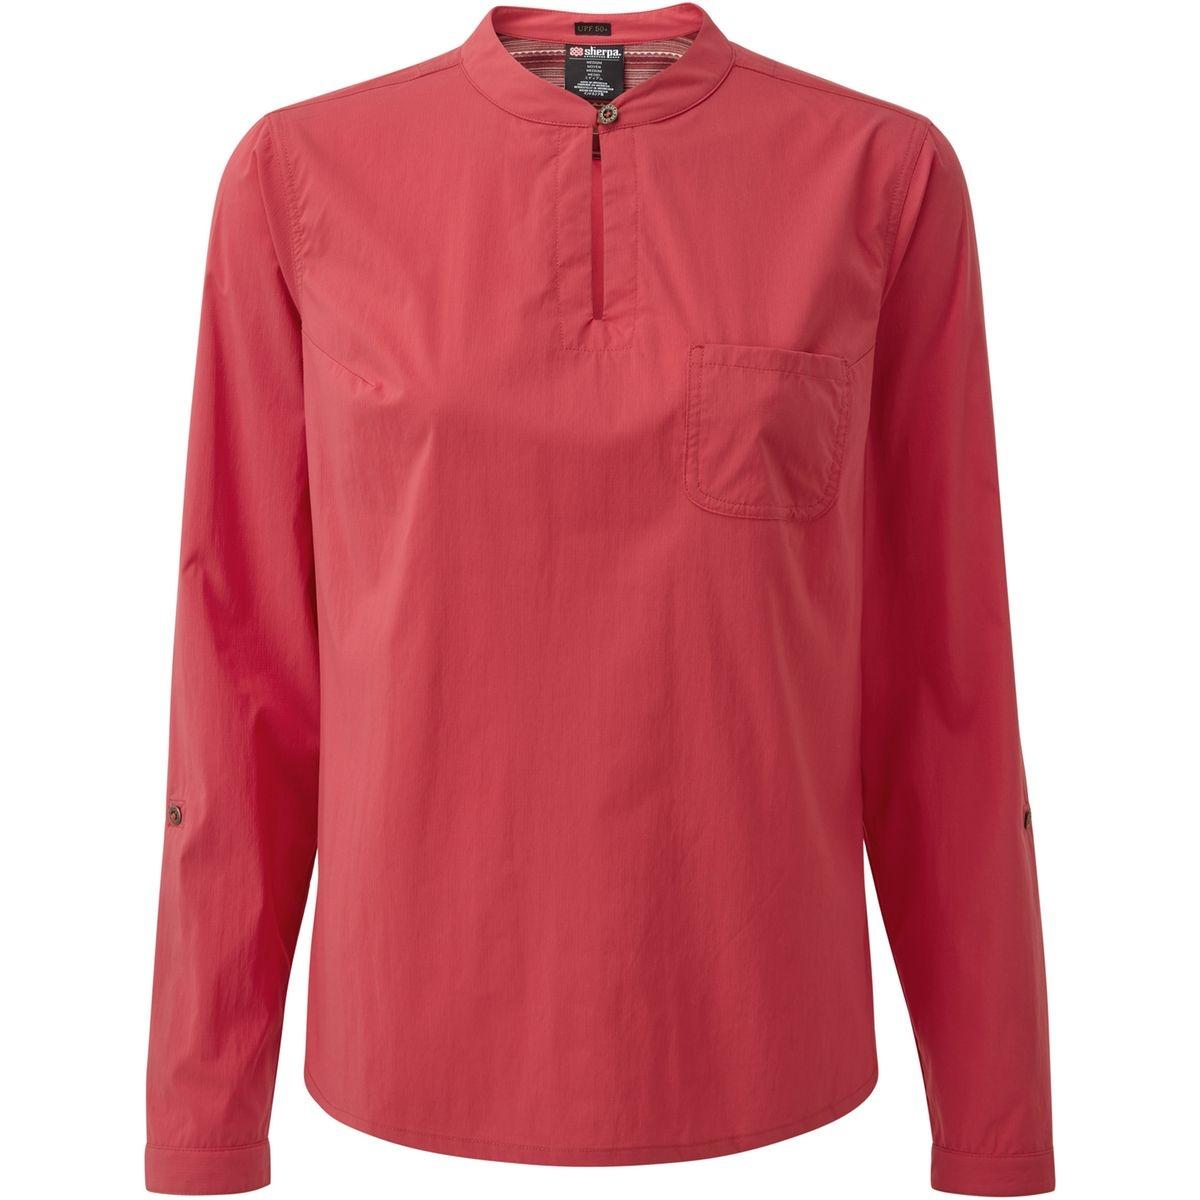 Ravi - T-shirt manches longues Femme - rose